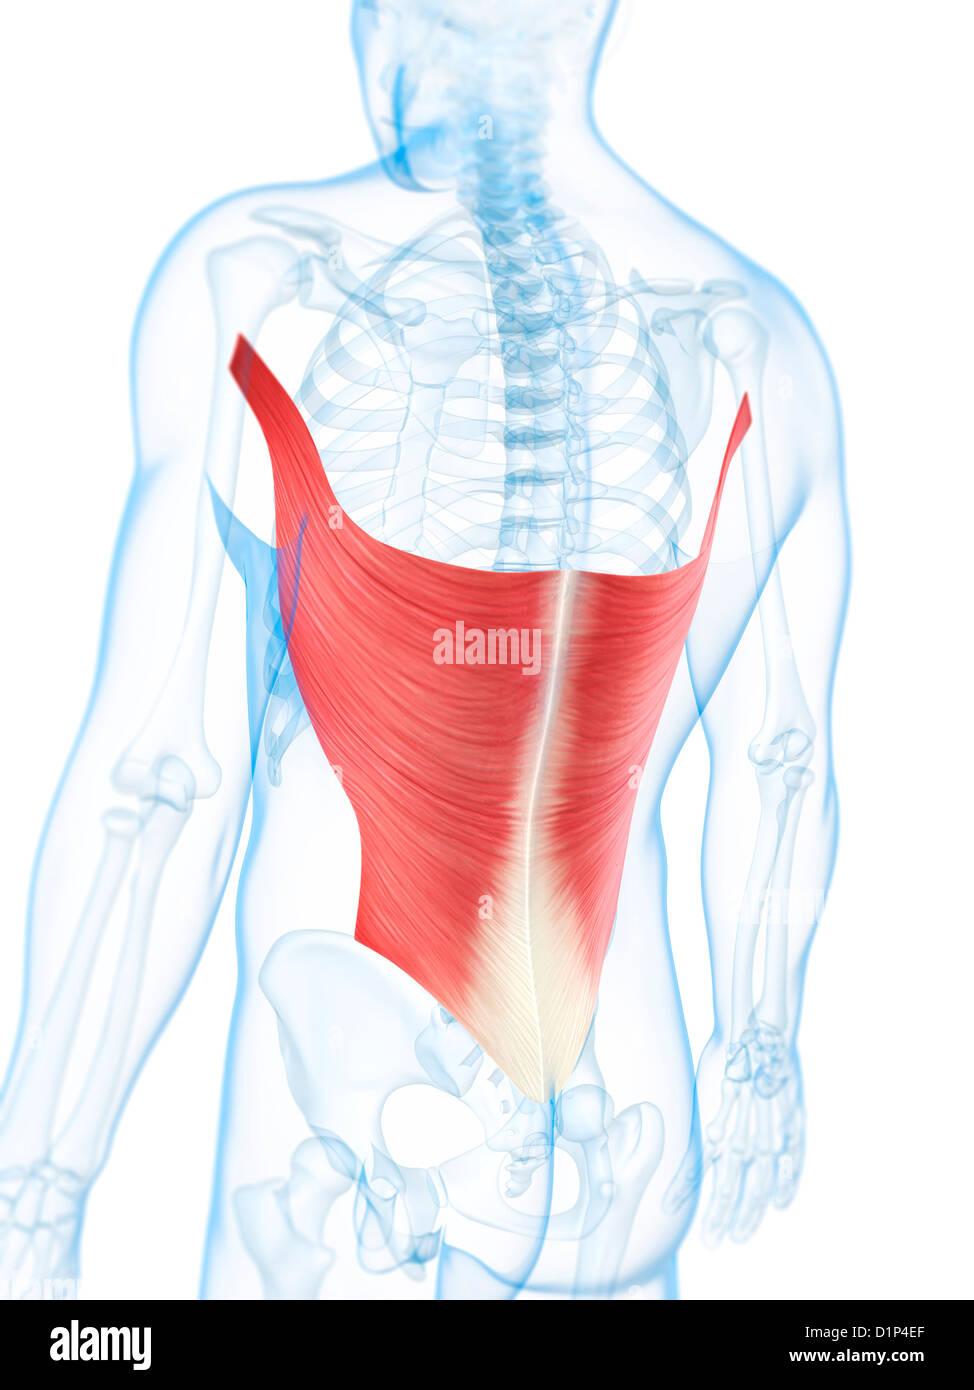 Muscles Of The Back Imágenes De Stock & Muscles Of The Back Fotos De ...